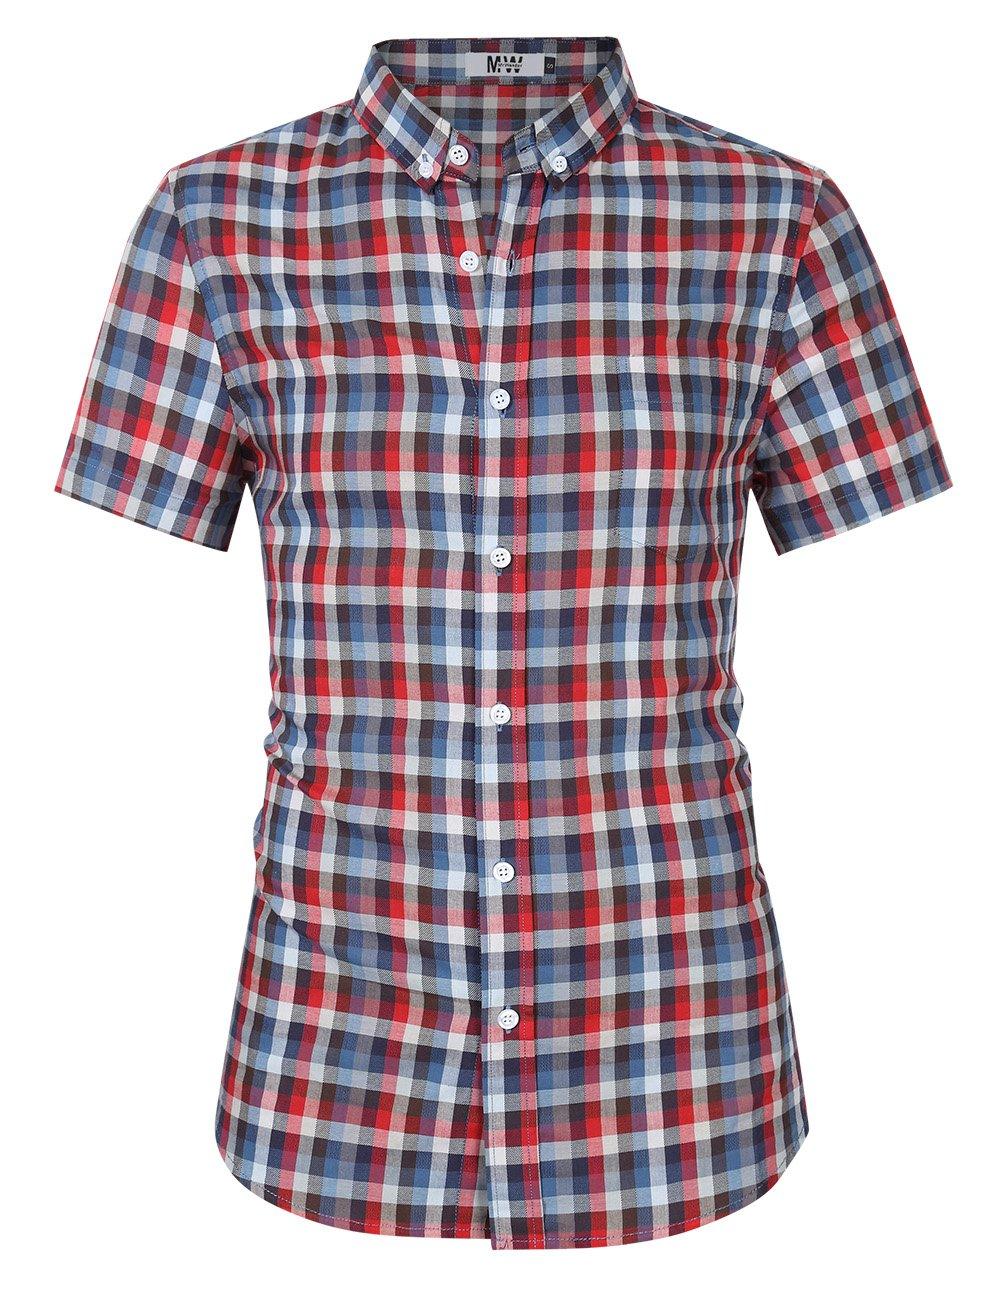 MrWonder Men's Casual Slim Fit Long Sleeve Button Down Shirts Plaid Twill Shirt (L, Red Grey)